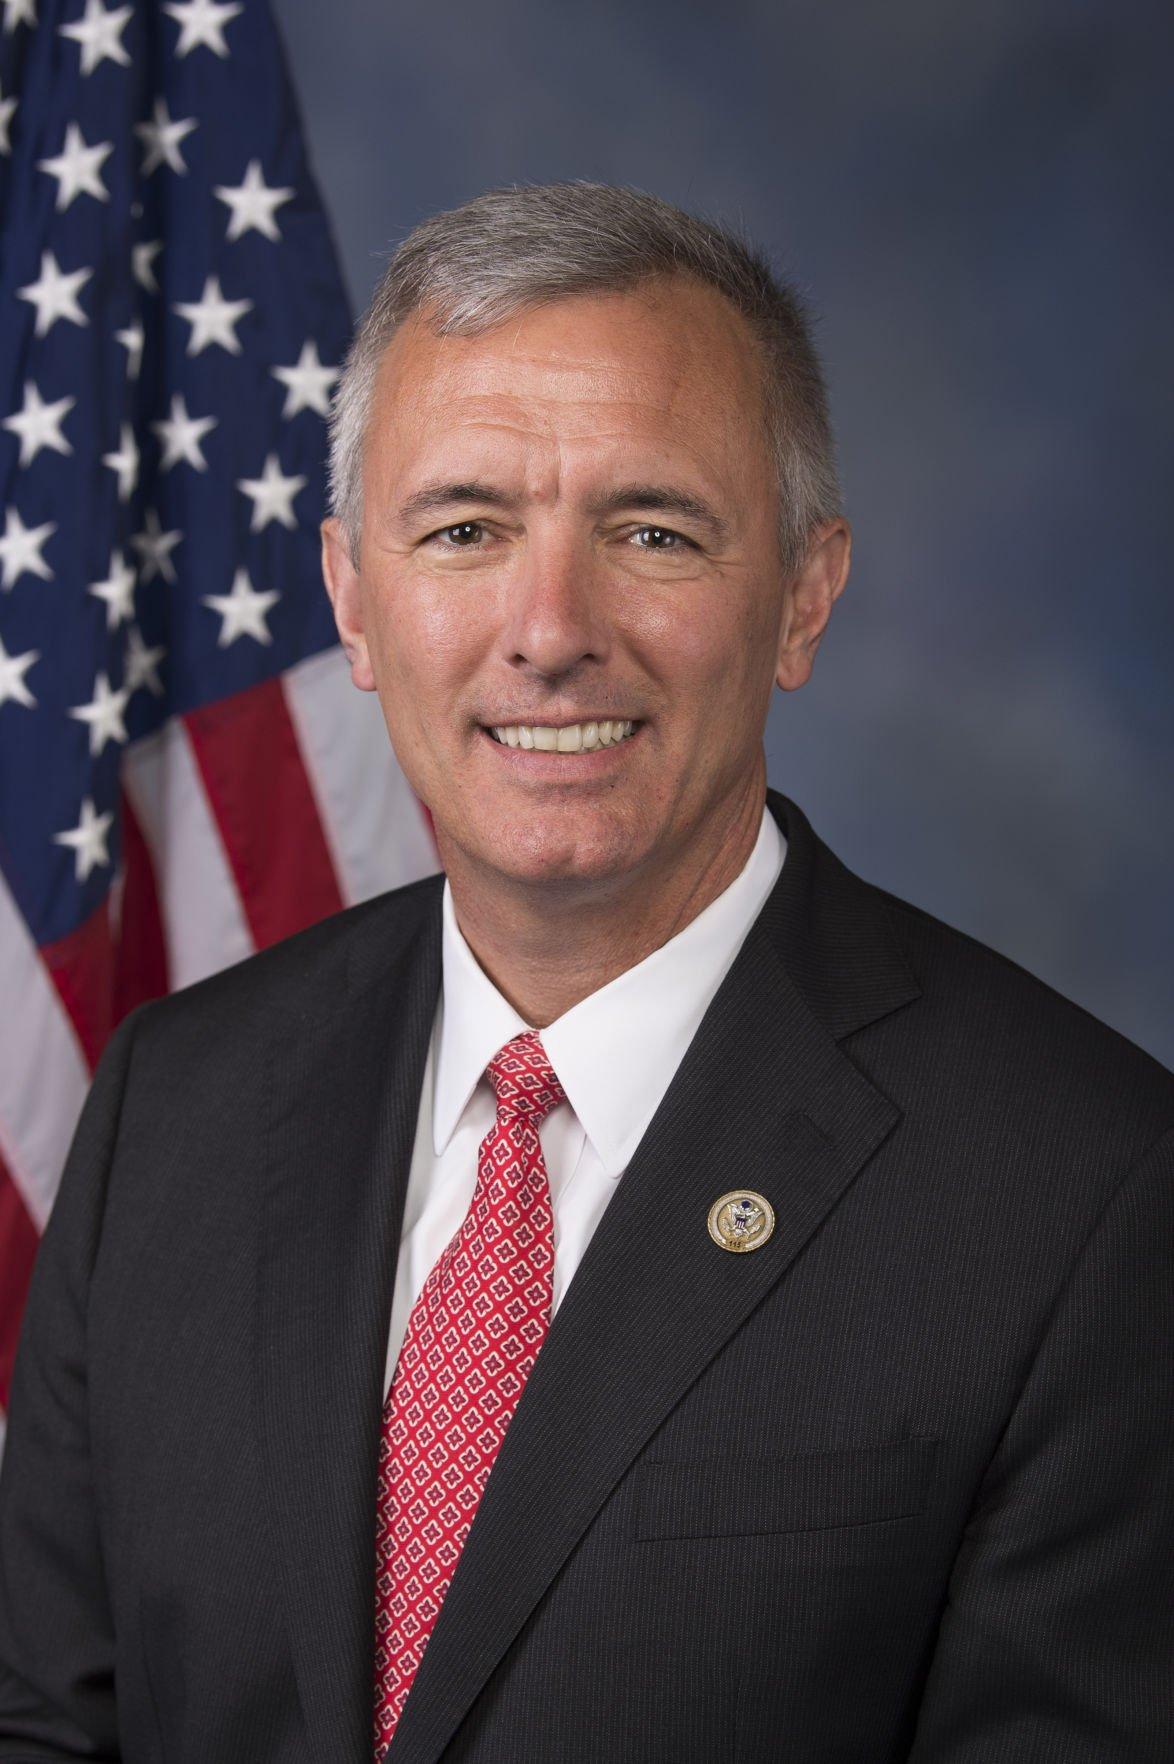 U.S. Rep. John Katko